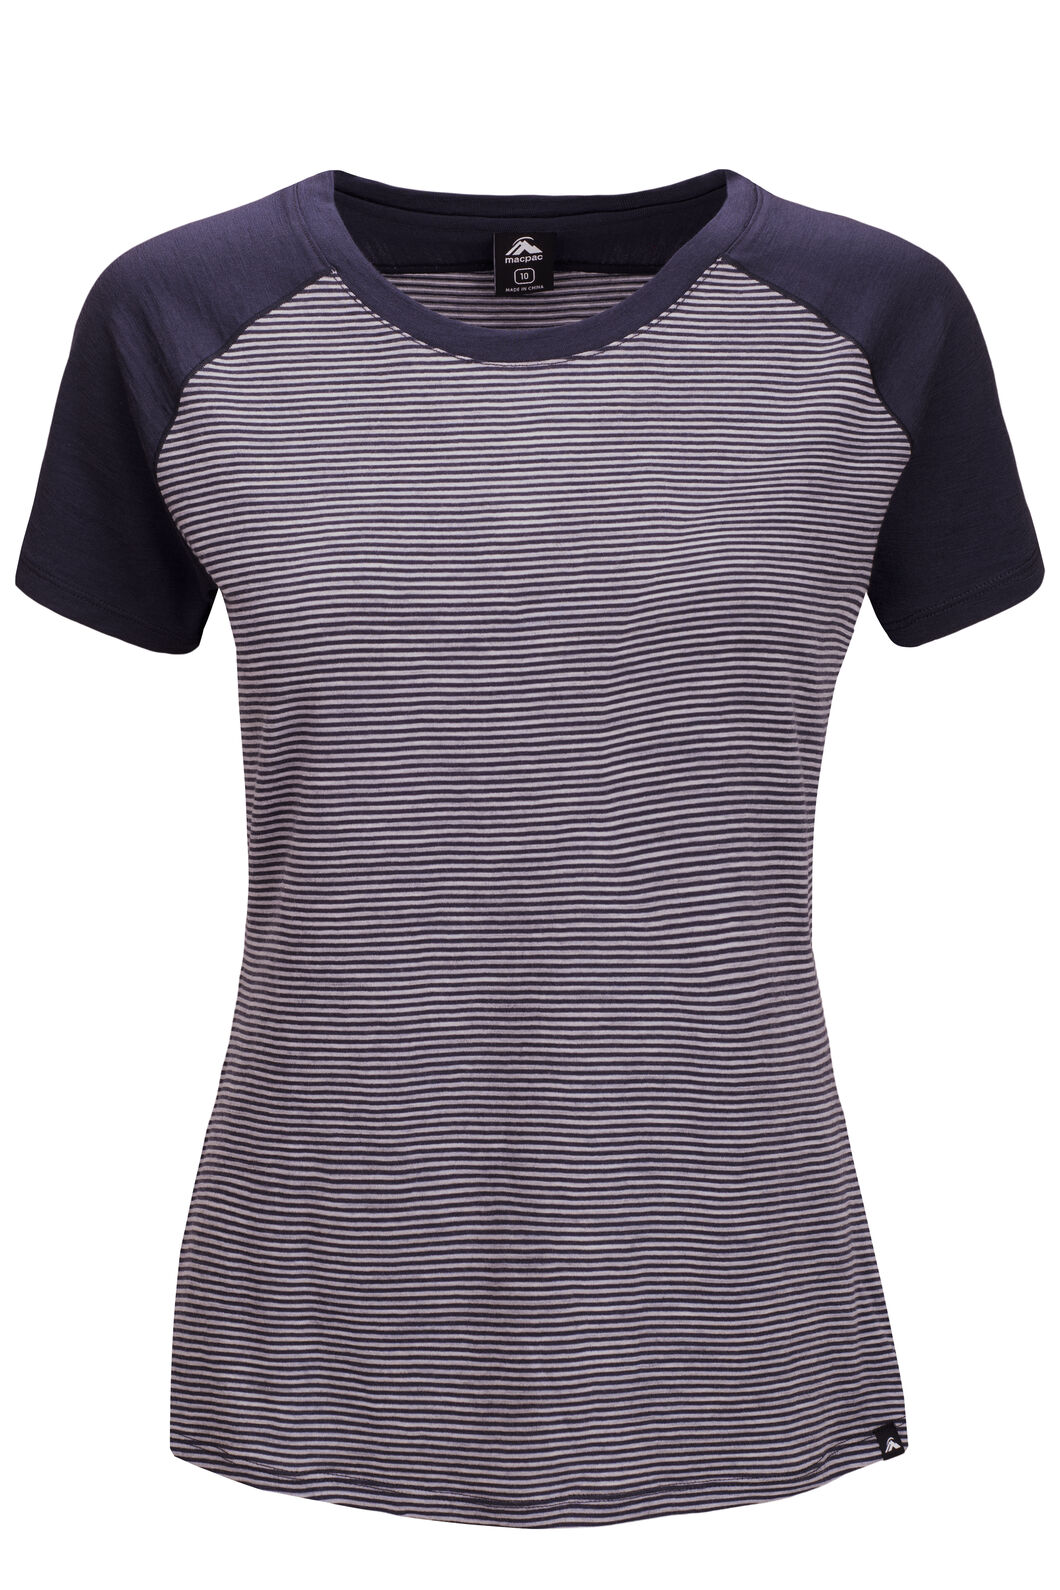 Macpac Ella Short Sleeve Merino Tee — Women's, Blue Nights Stripe, hi-res